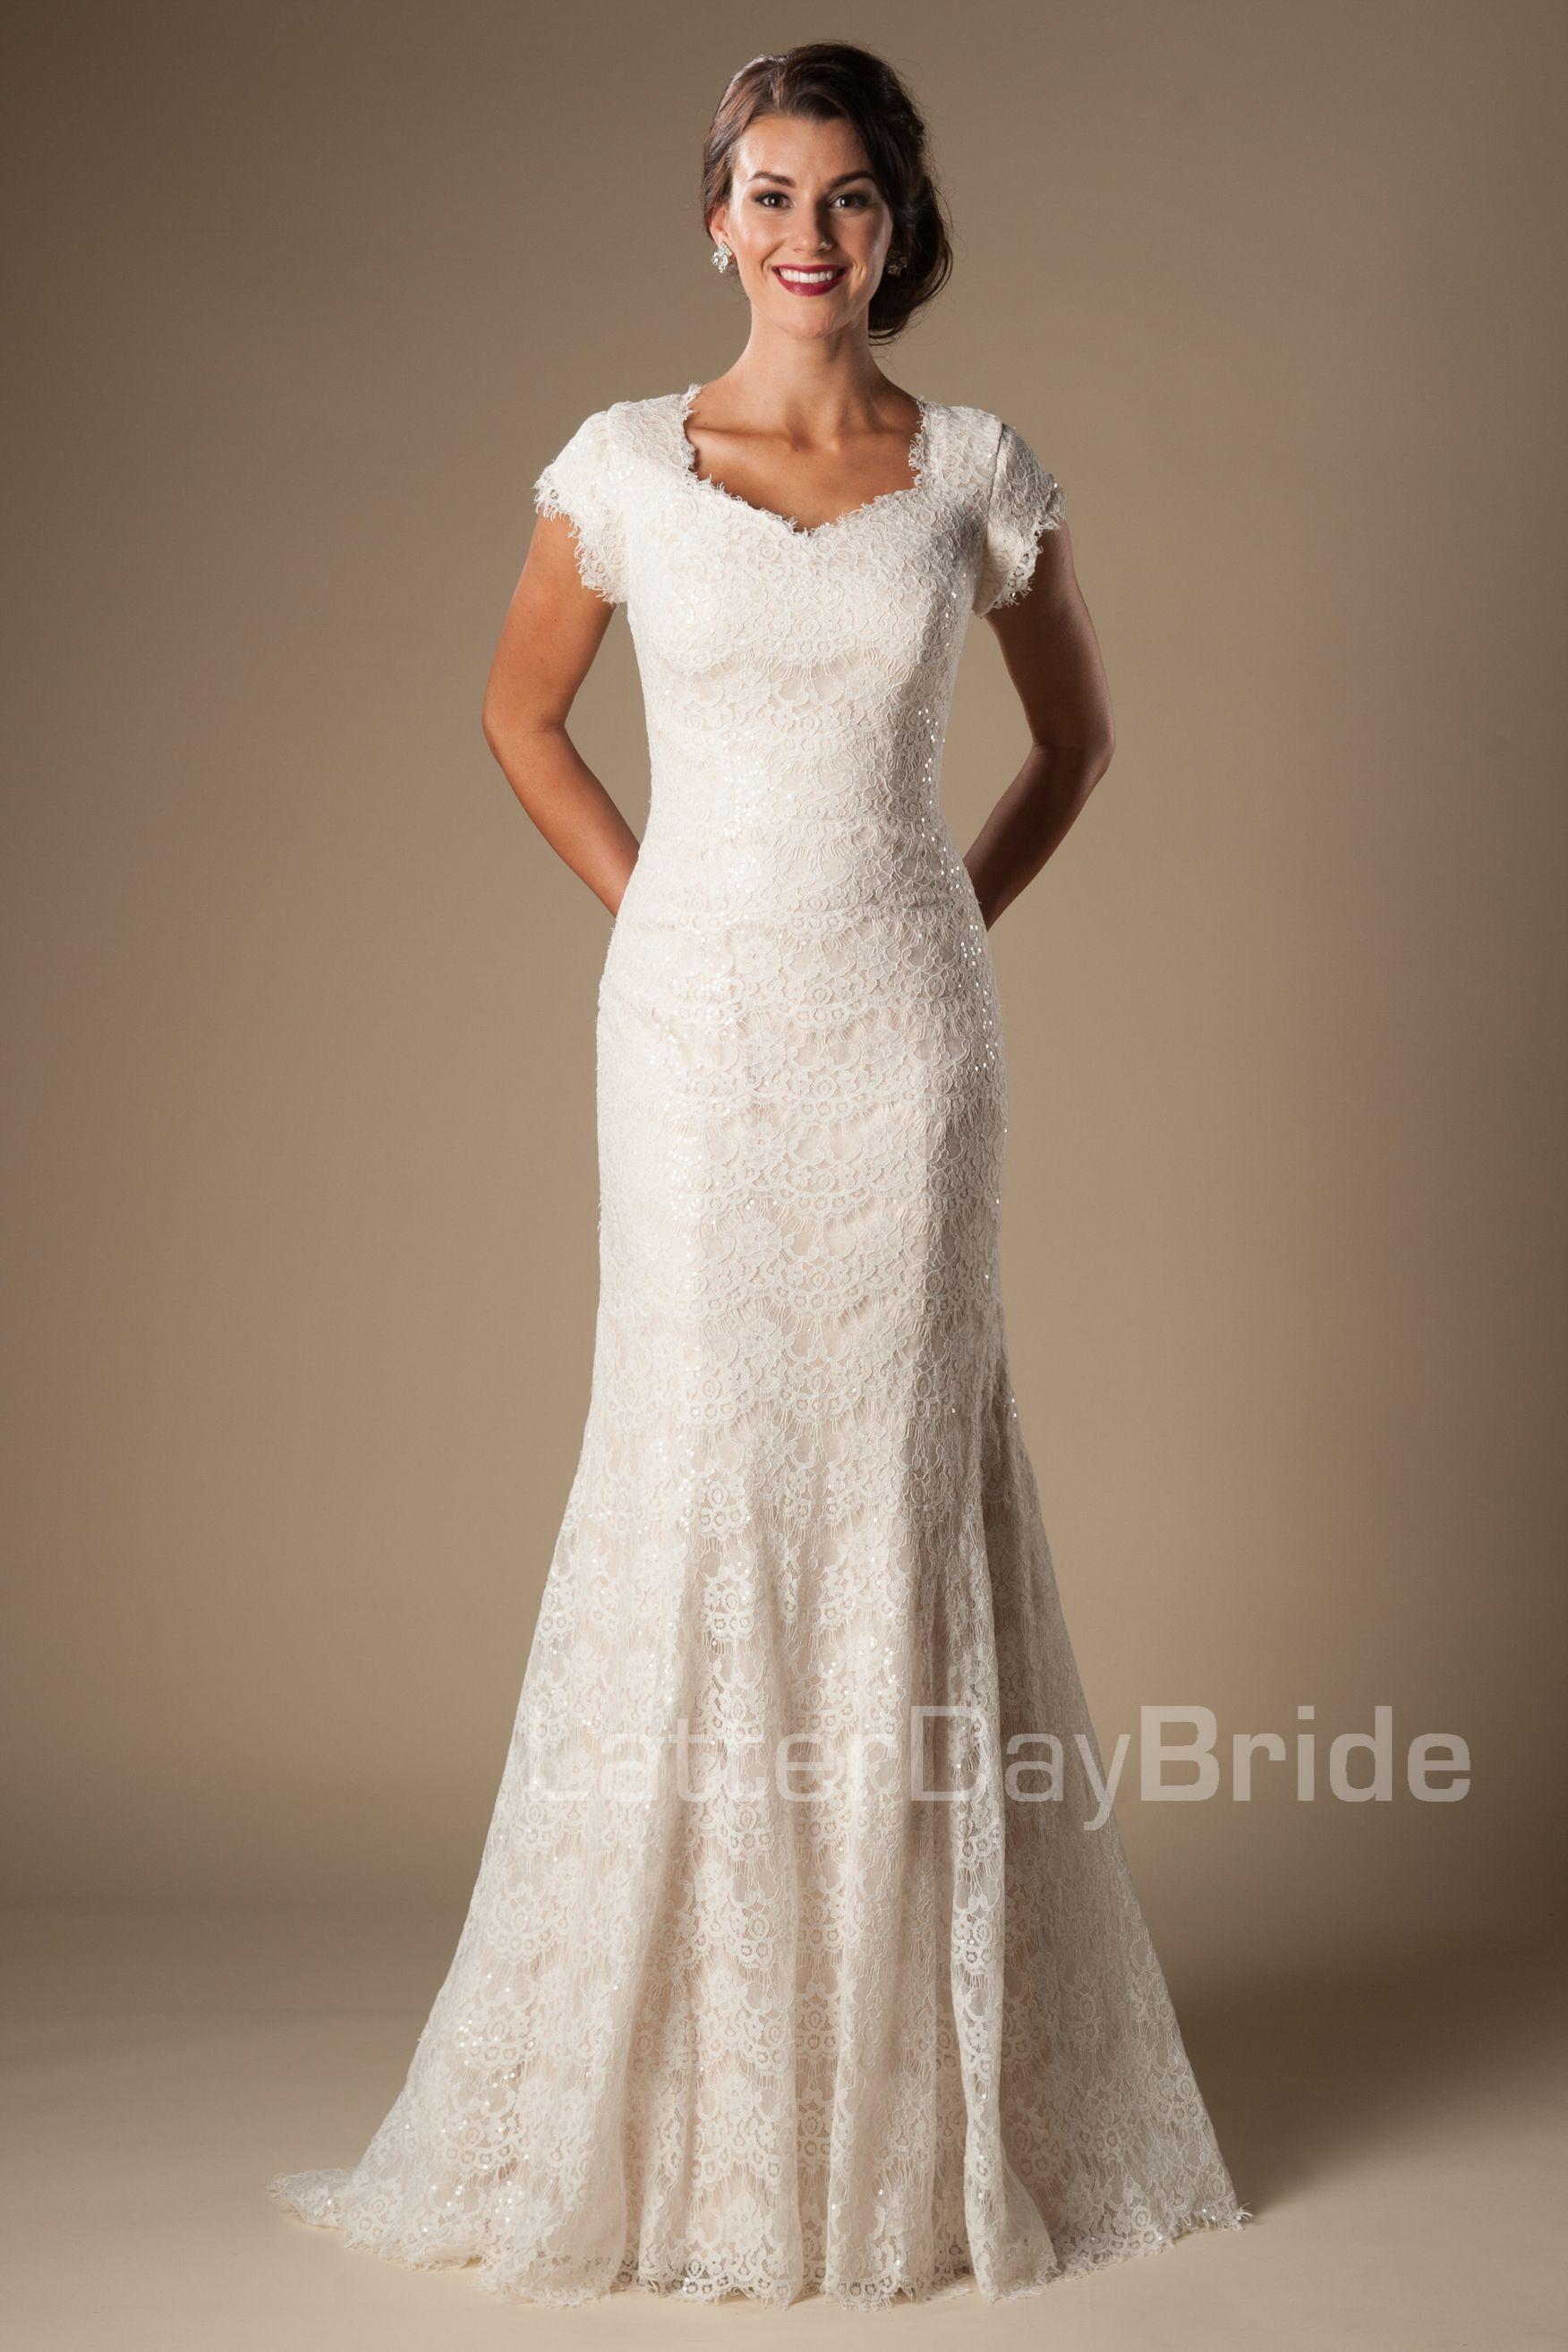 Modestweddingdressmanchesterfrontg modern wedding dresses